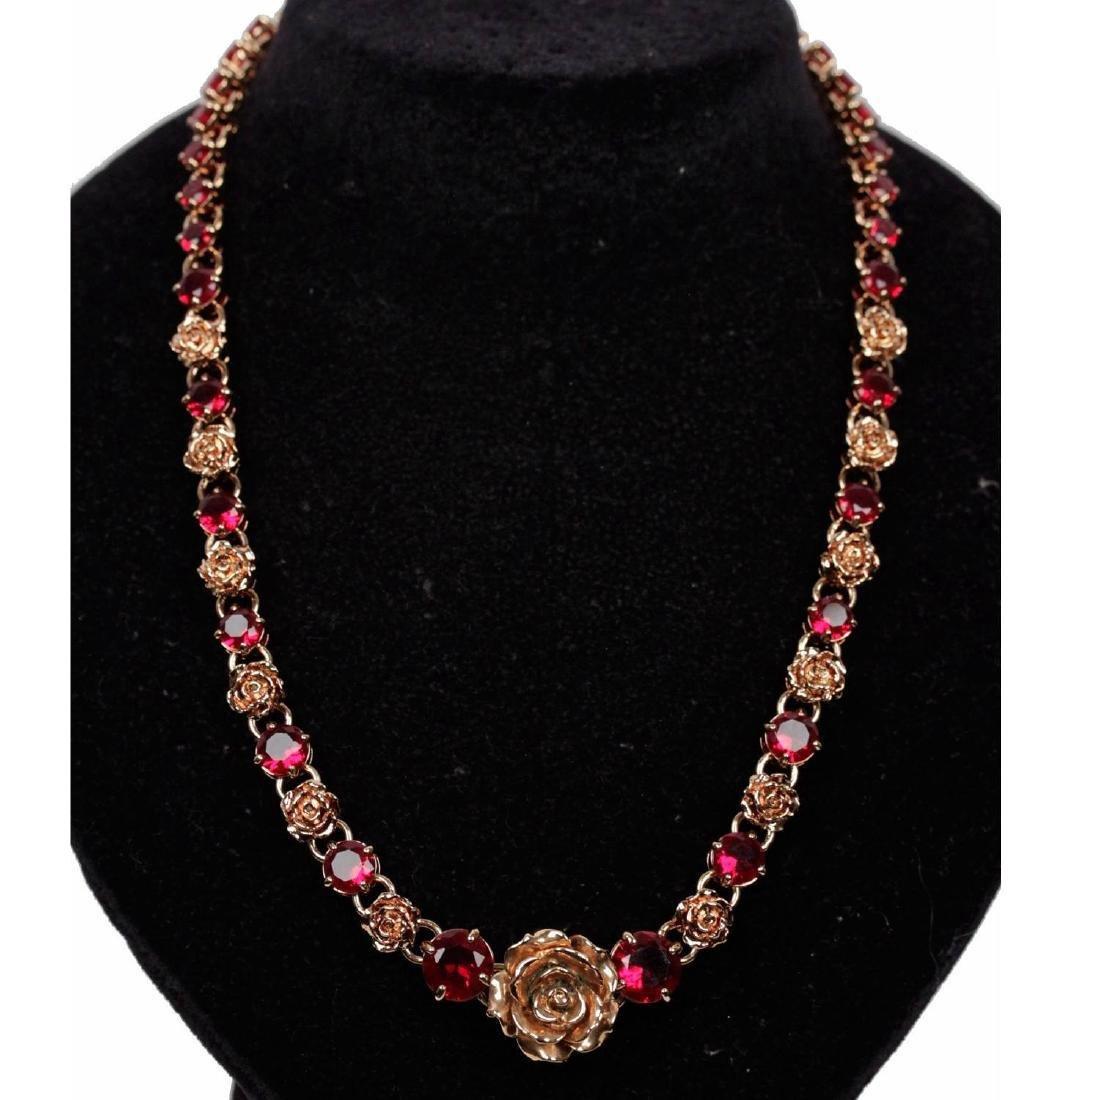 Prada Gold Metal Red Rhinestone Roses Necklace W/ Box